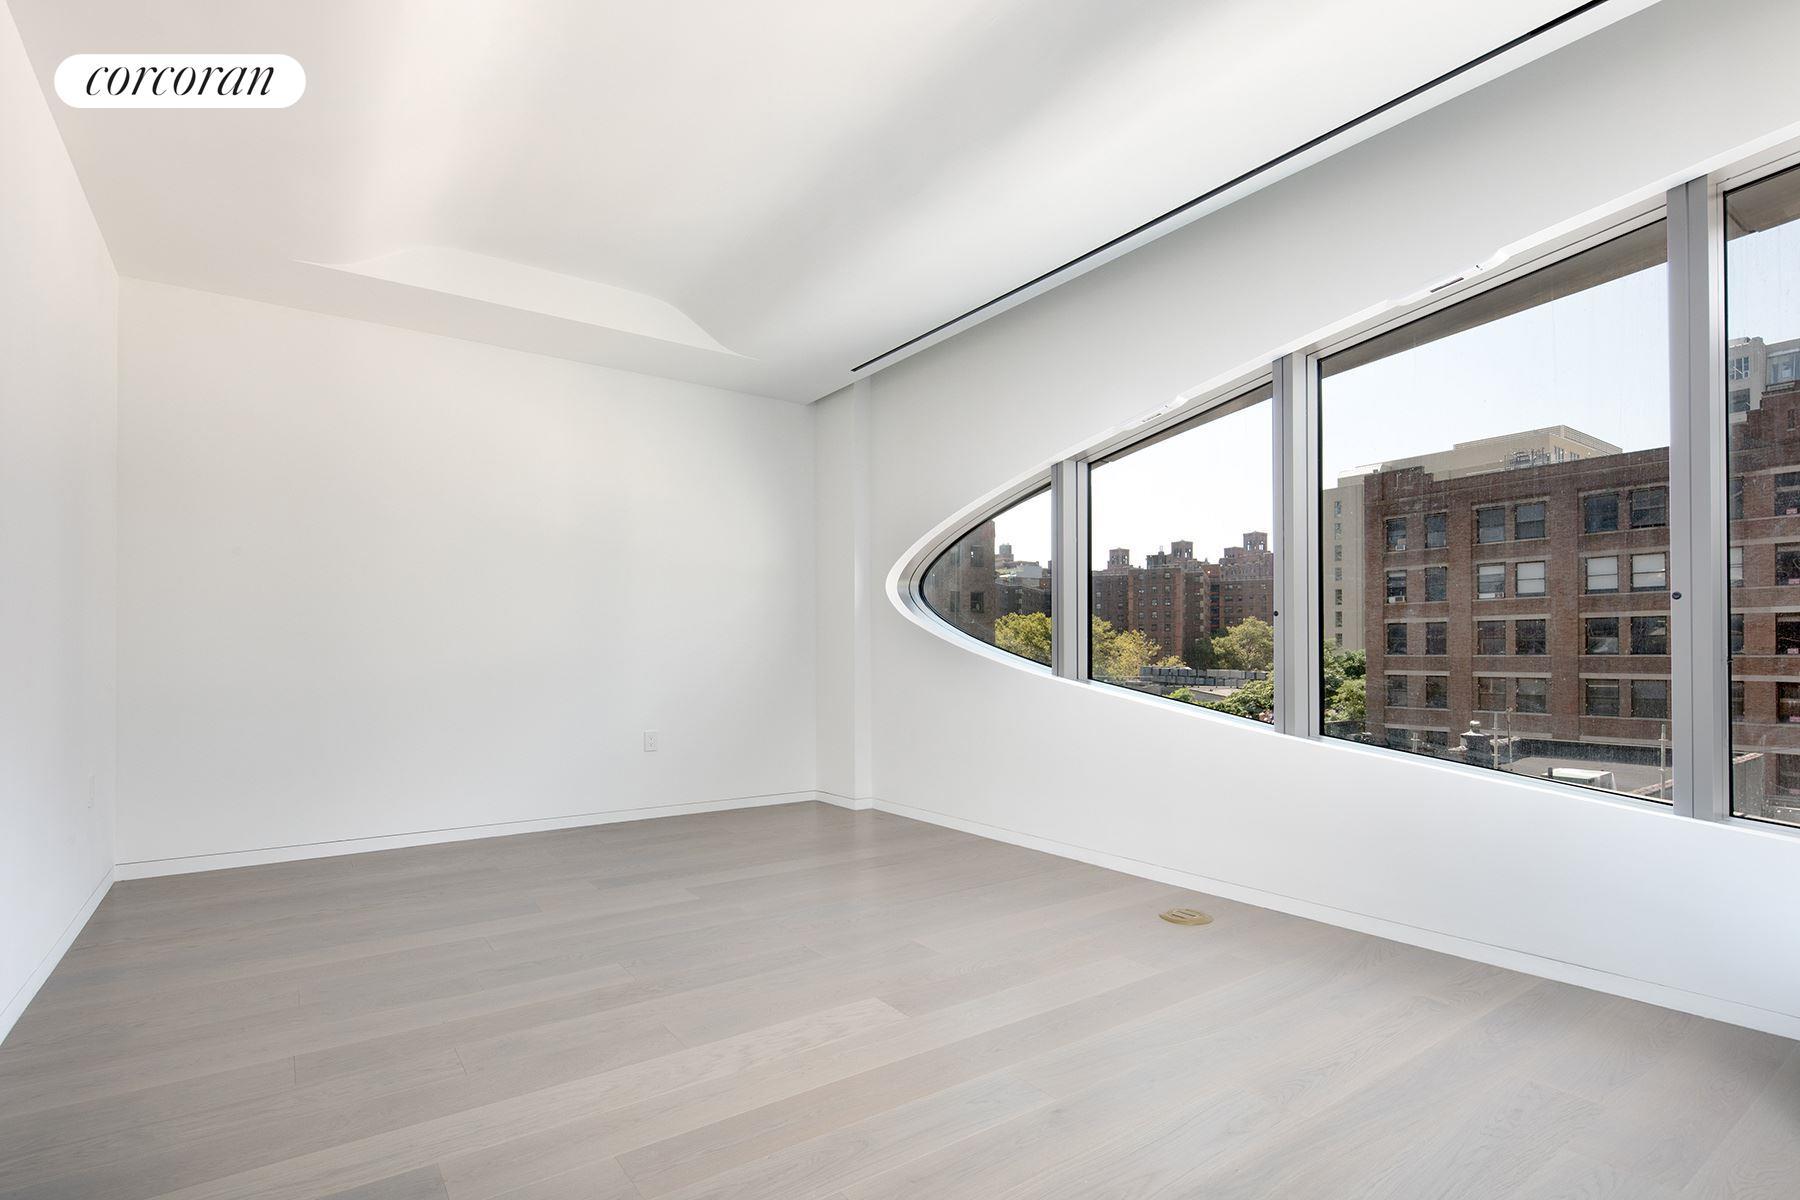 Corcoran, 520 West 28th Street, Apt. 14, Chelsea/Hudson Yards ...